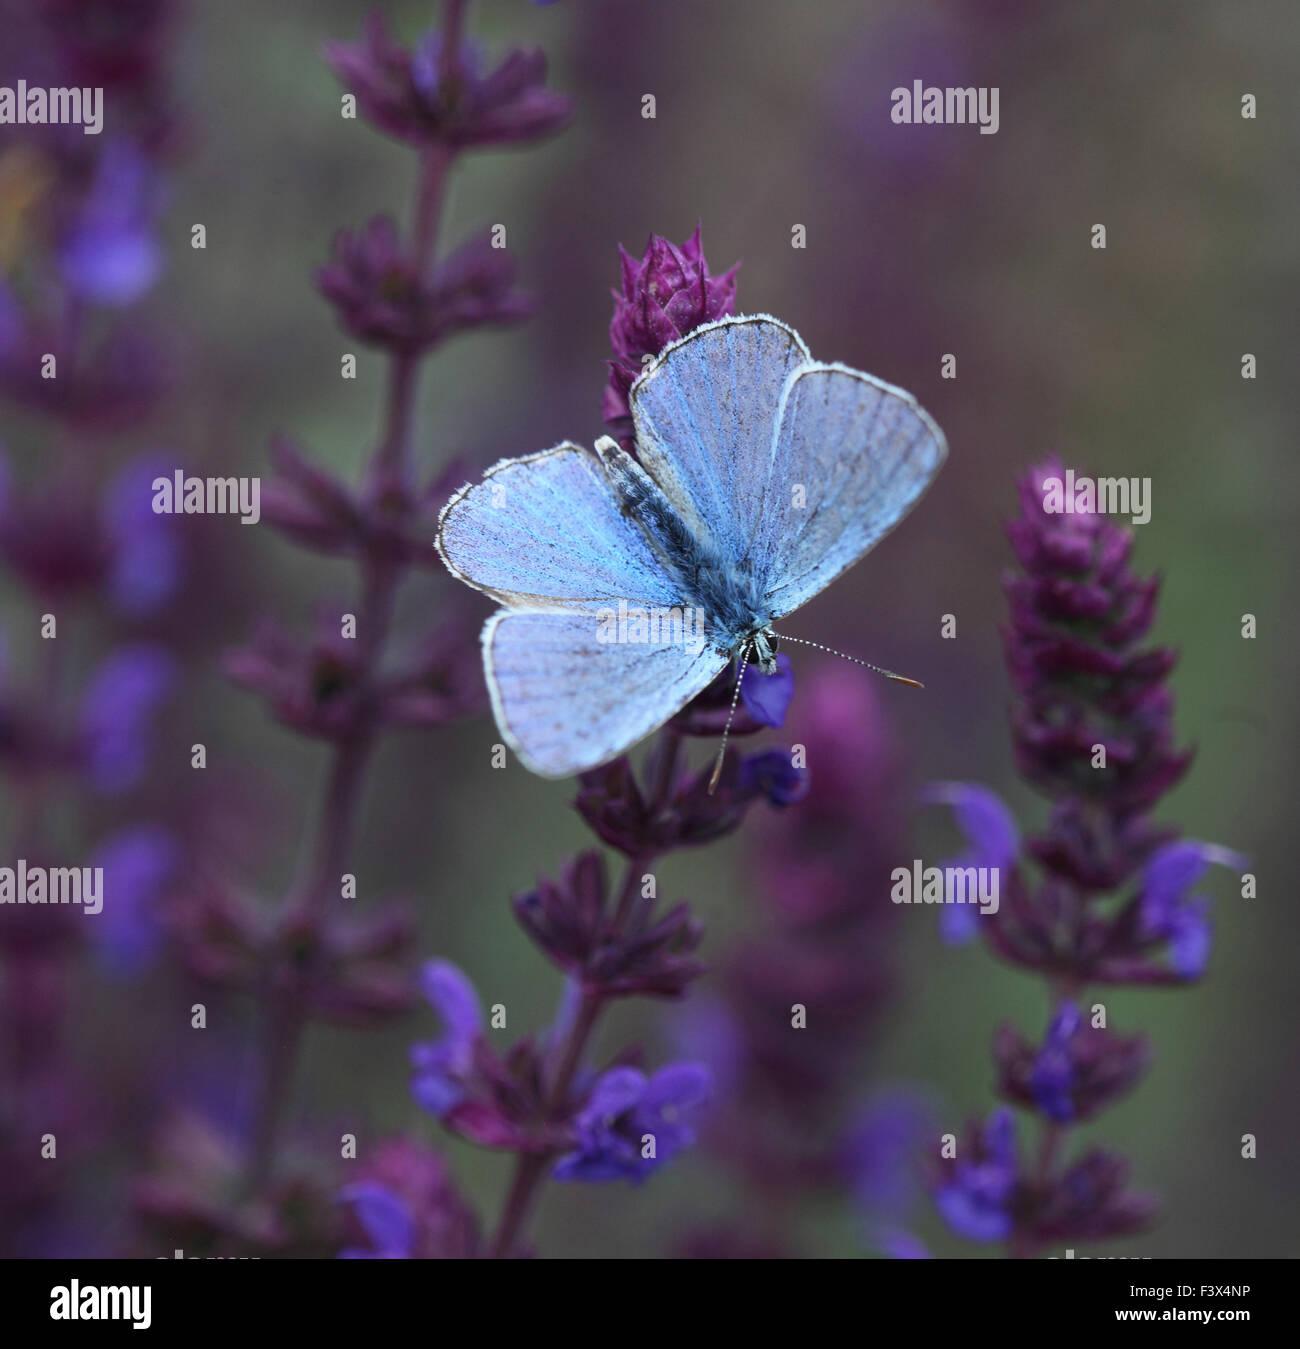 Feeding on wild sage wings open Hungary June 2015 - Stock Image